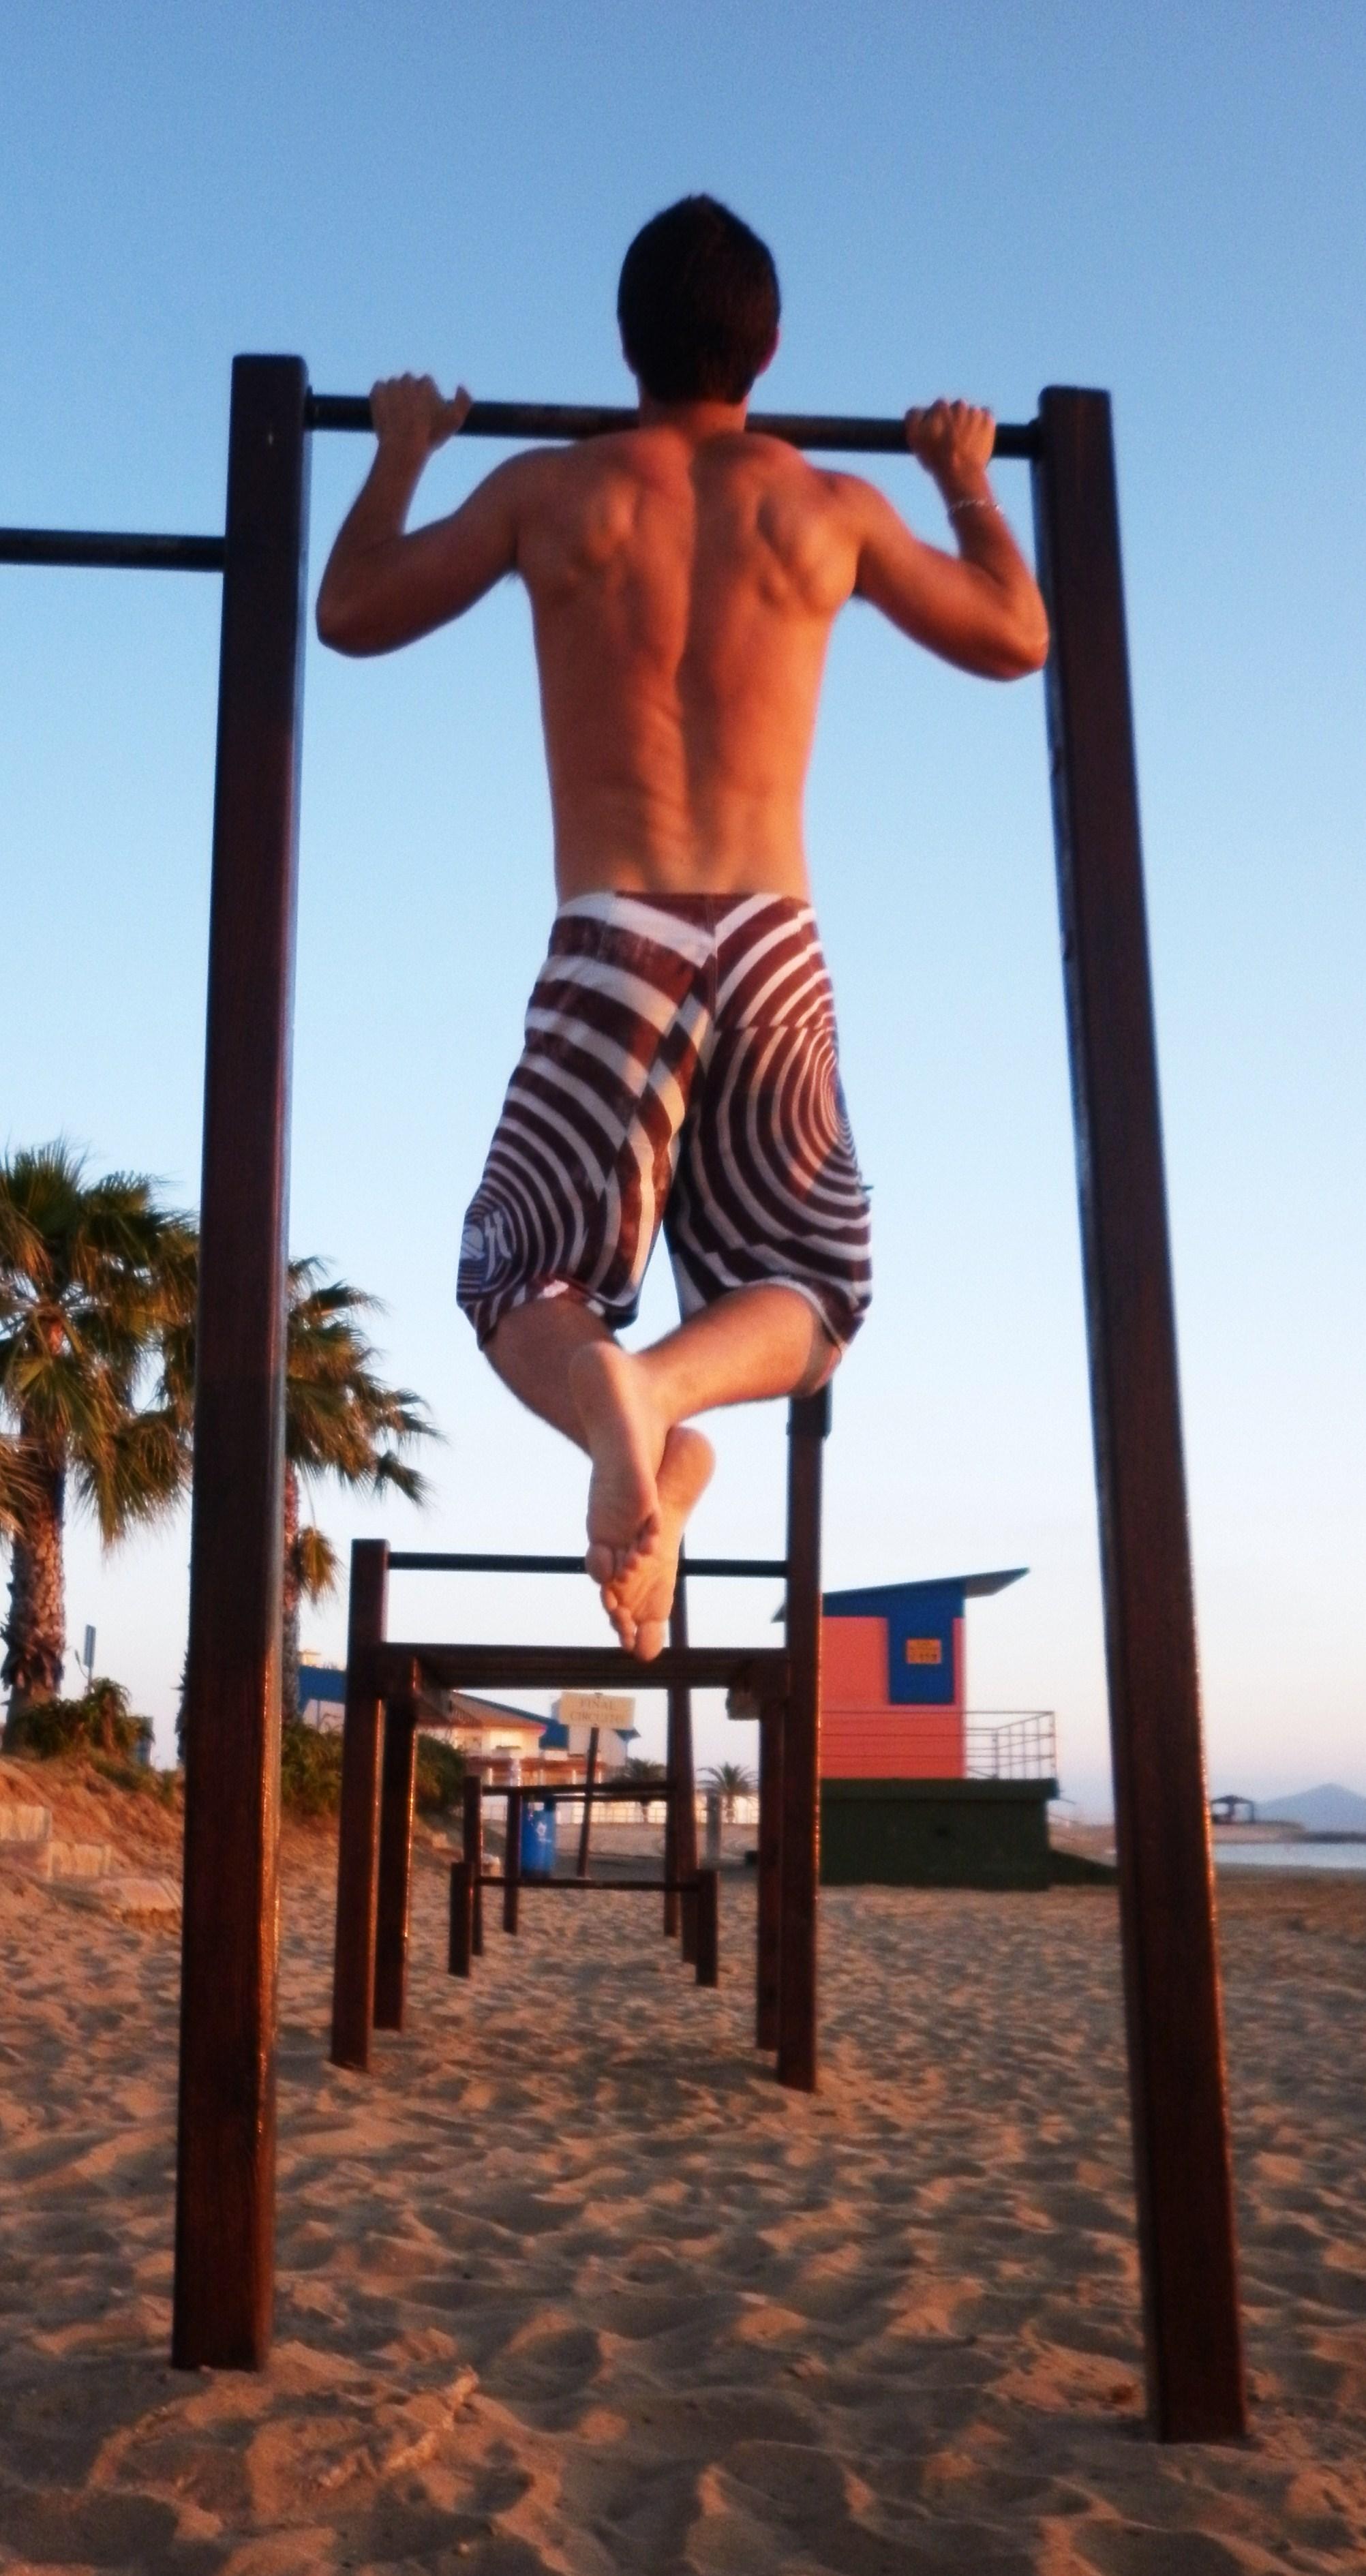 Hago deporte para adelgazar pero subo de peso por qu for Deportes para adelgazar